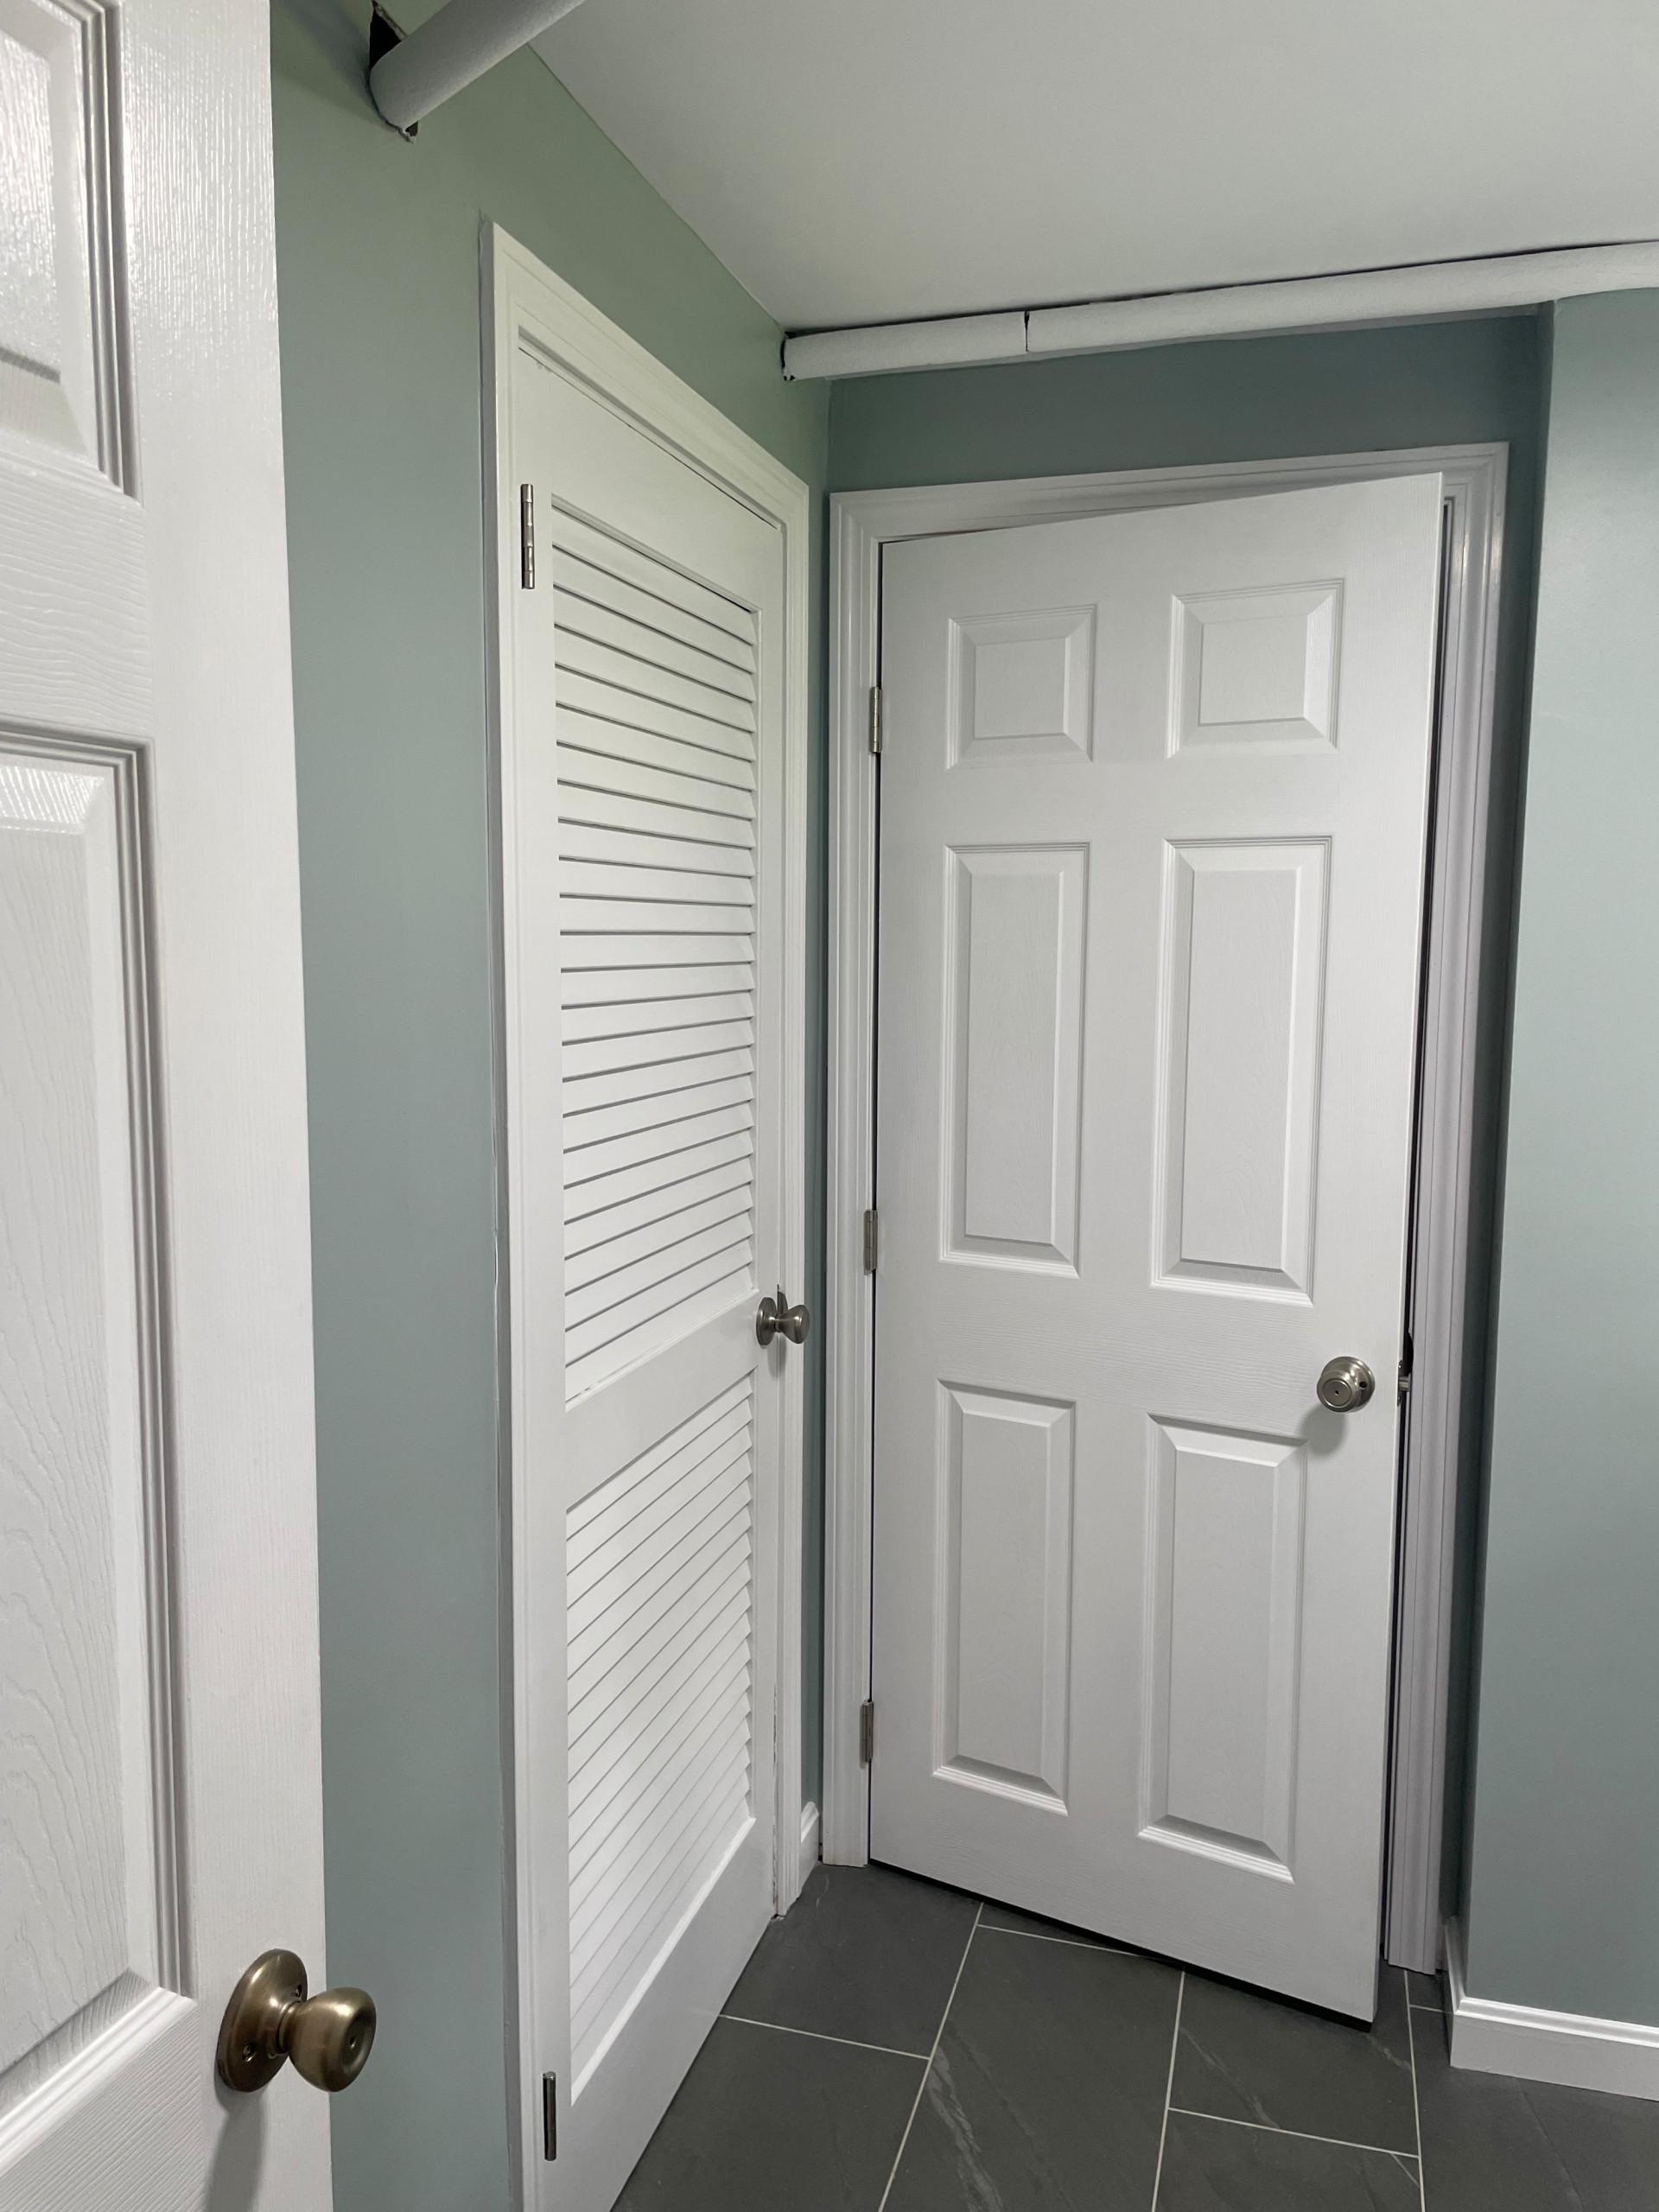 Kingston Basement Bathroom and Laundry upgrade